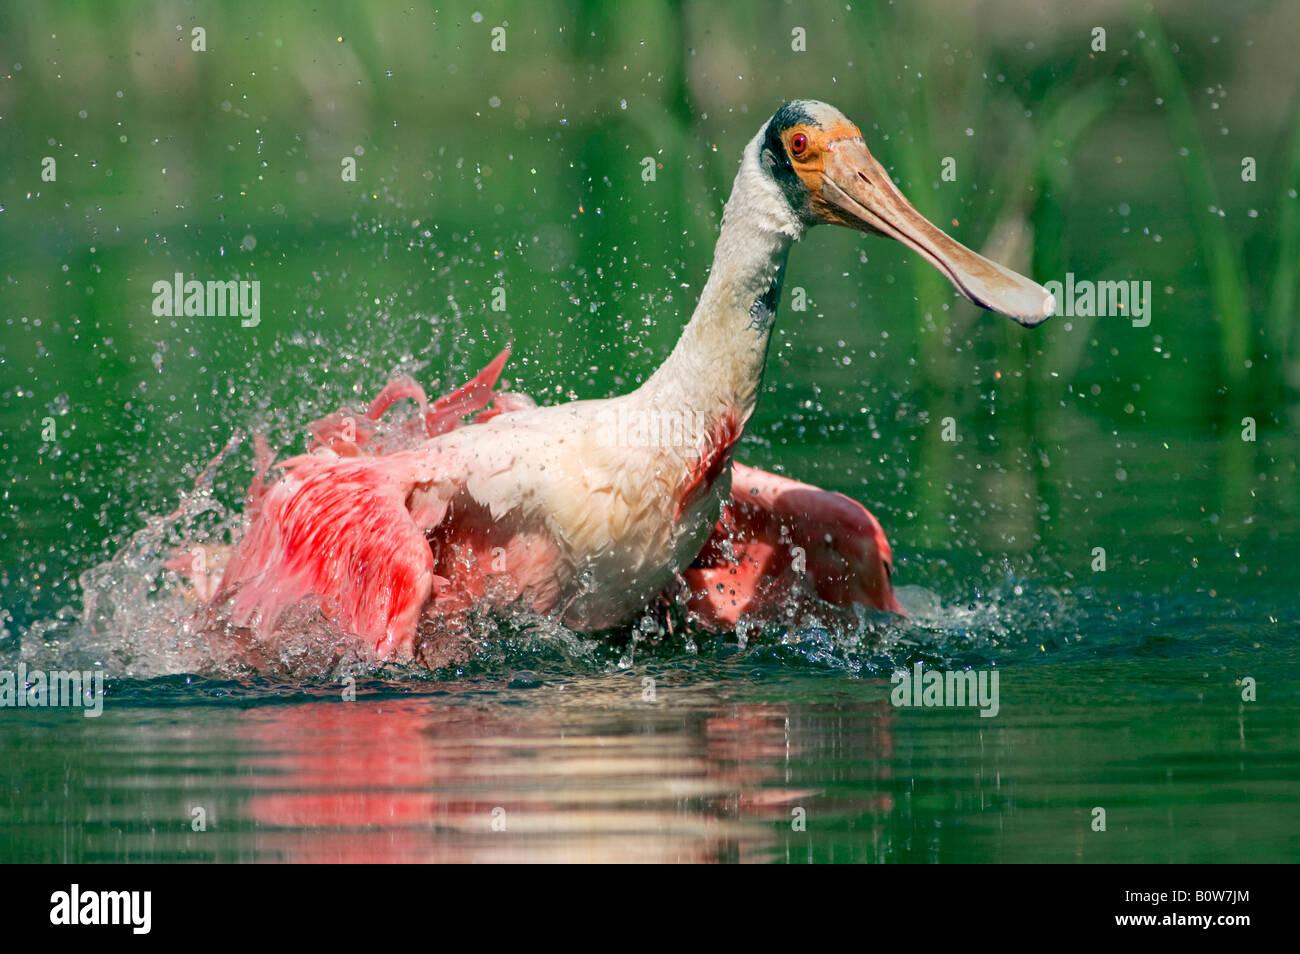 Roseate Spoonbill (Ajaja ajaja) bathing, Florida, USA Stock Photo